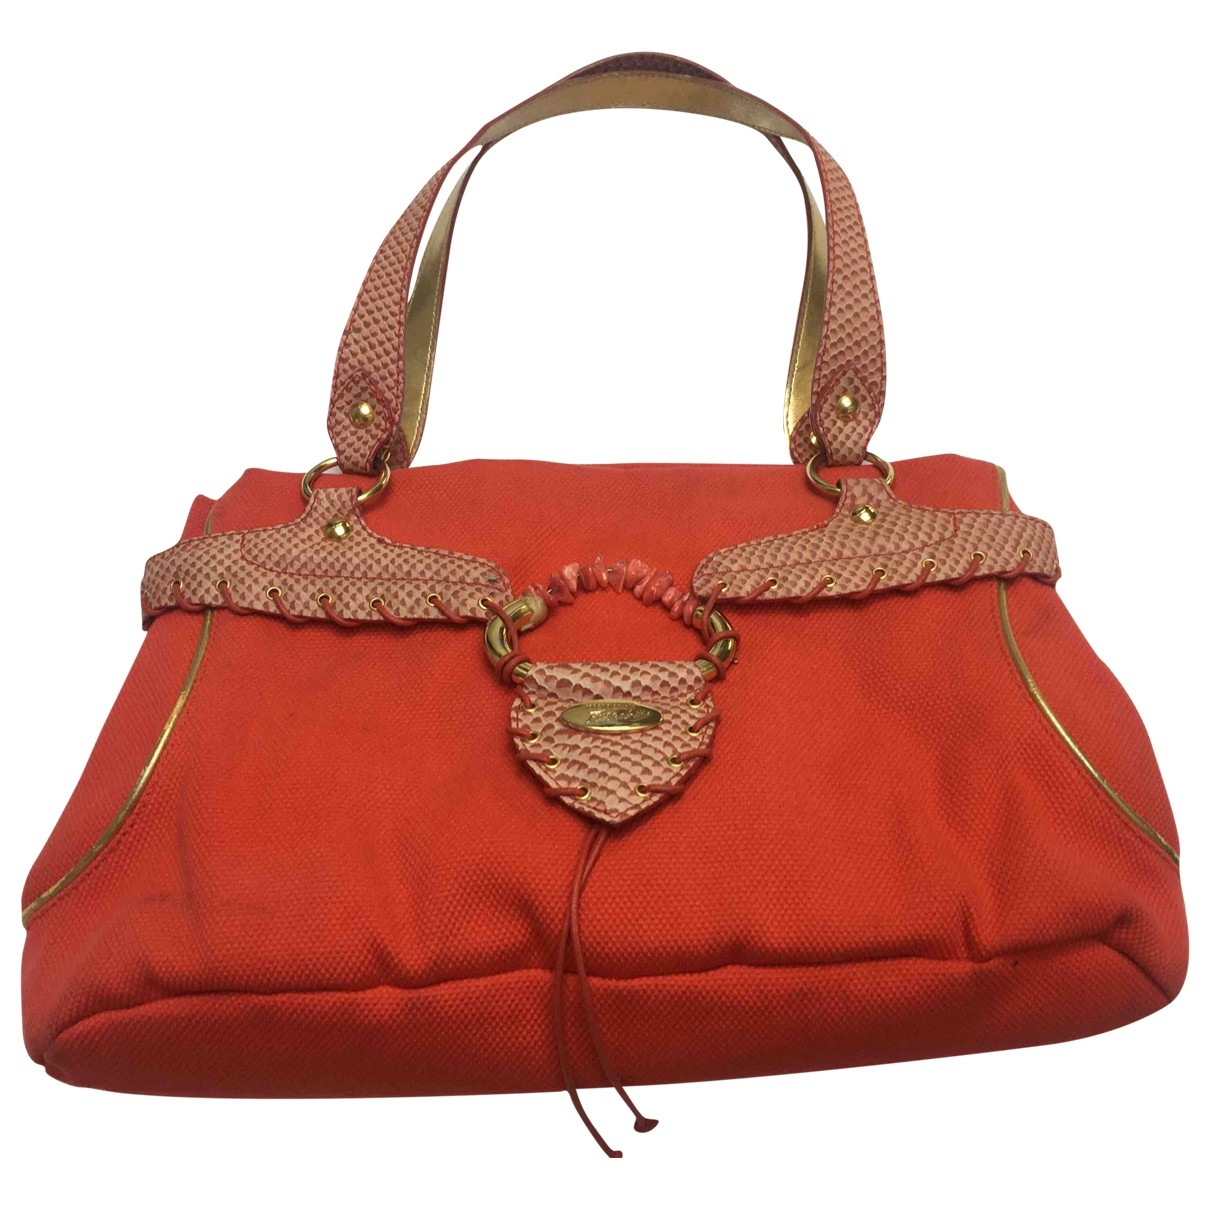 Roberto Cavalli \N Orange Cloth handbag for Women \N